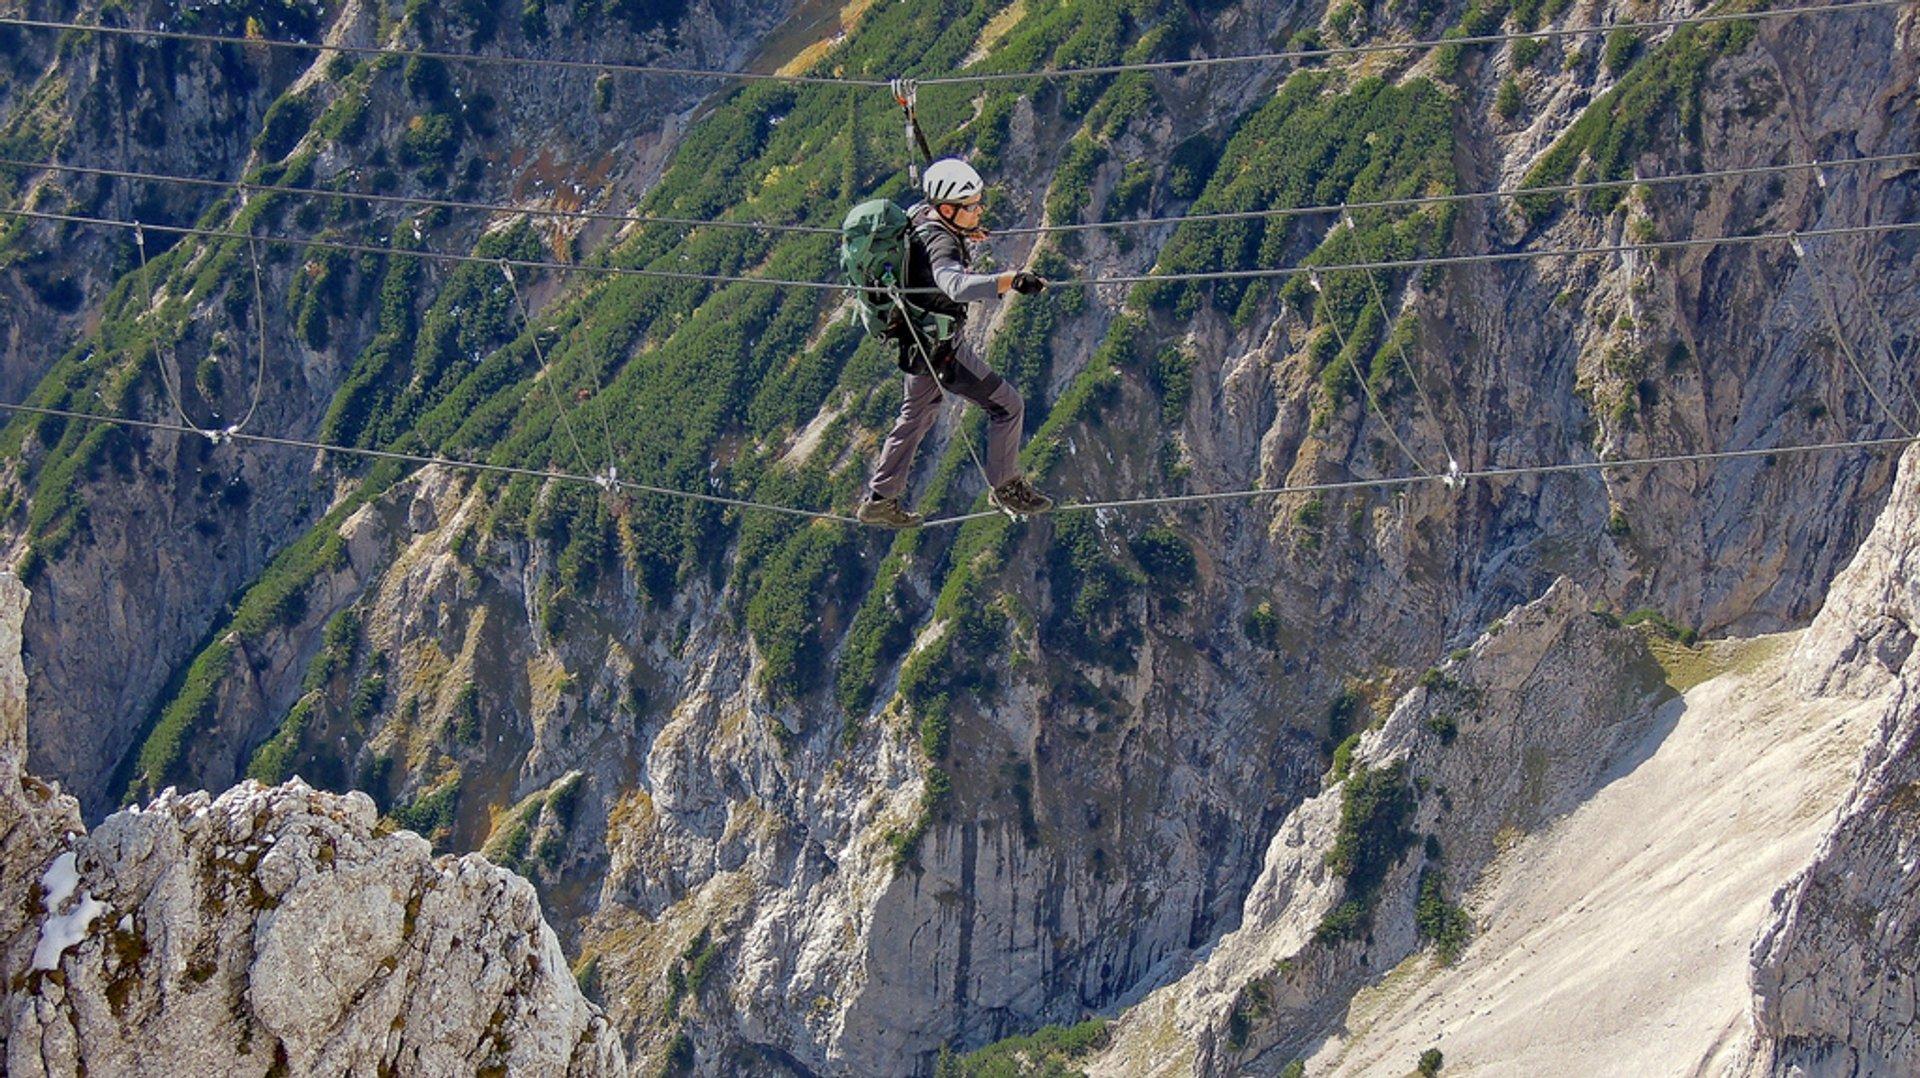 Best time for Via Ferrata in Austria 2020